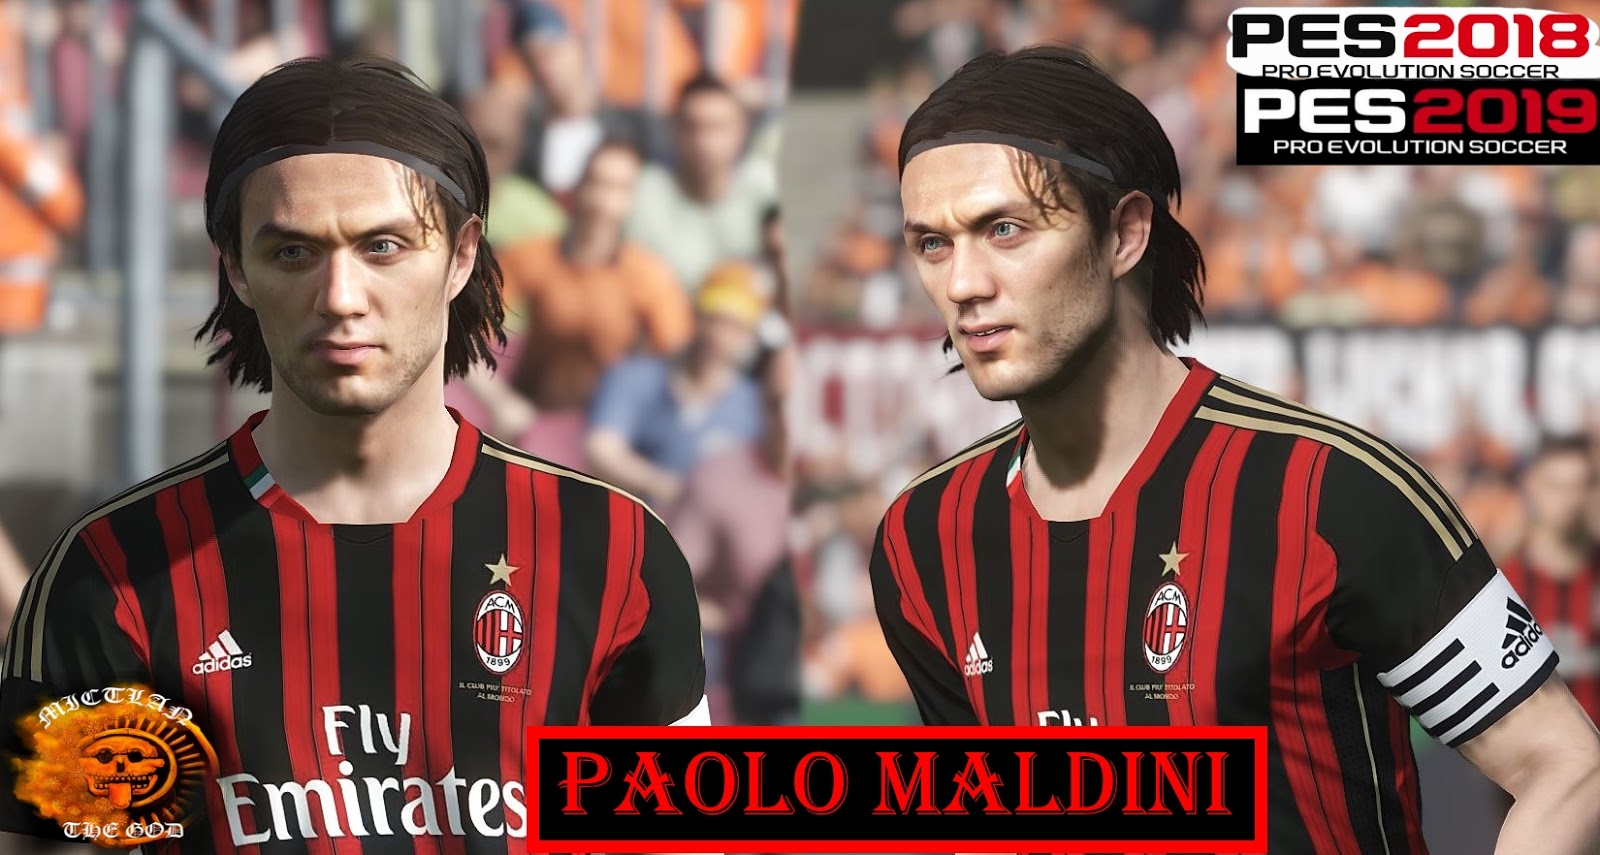 PES 2018 / PES 2019 Paolo Maldini face by MictlanTheGod